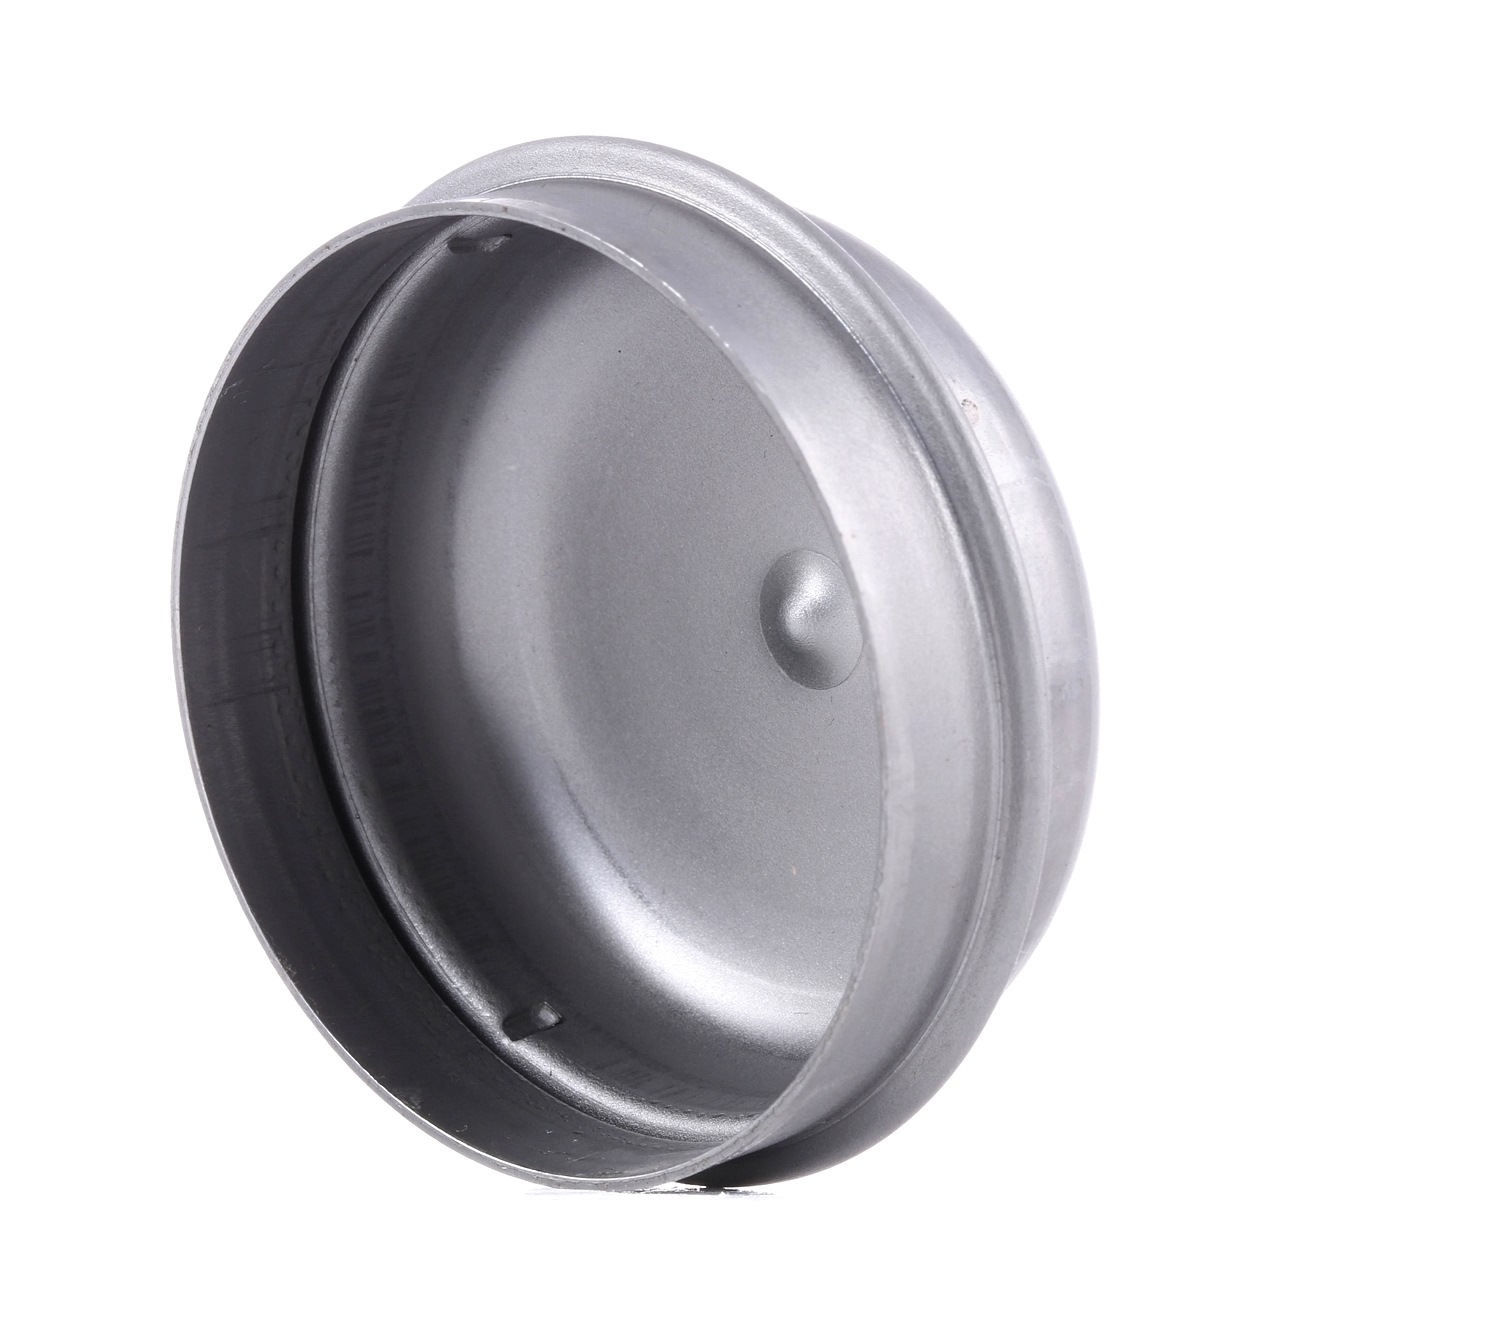 Bearing grease cap TRUCKTEC AUTOMOTIVE 02.31.002 rating